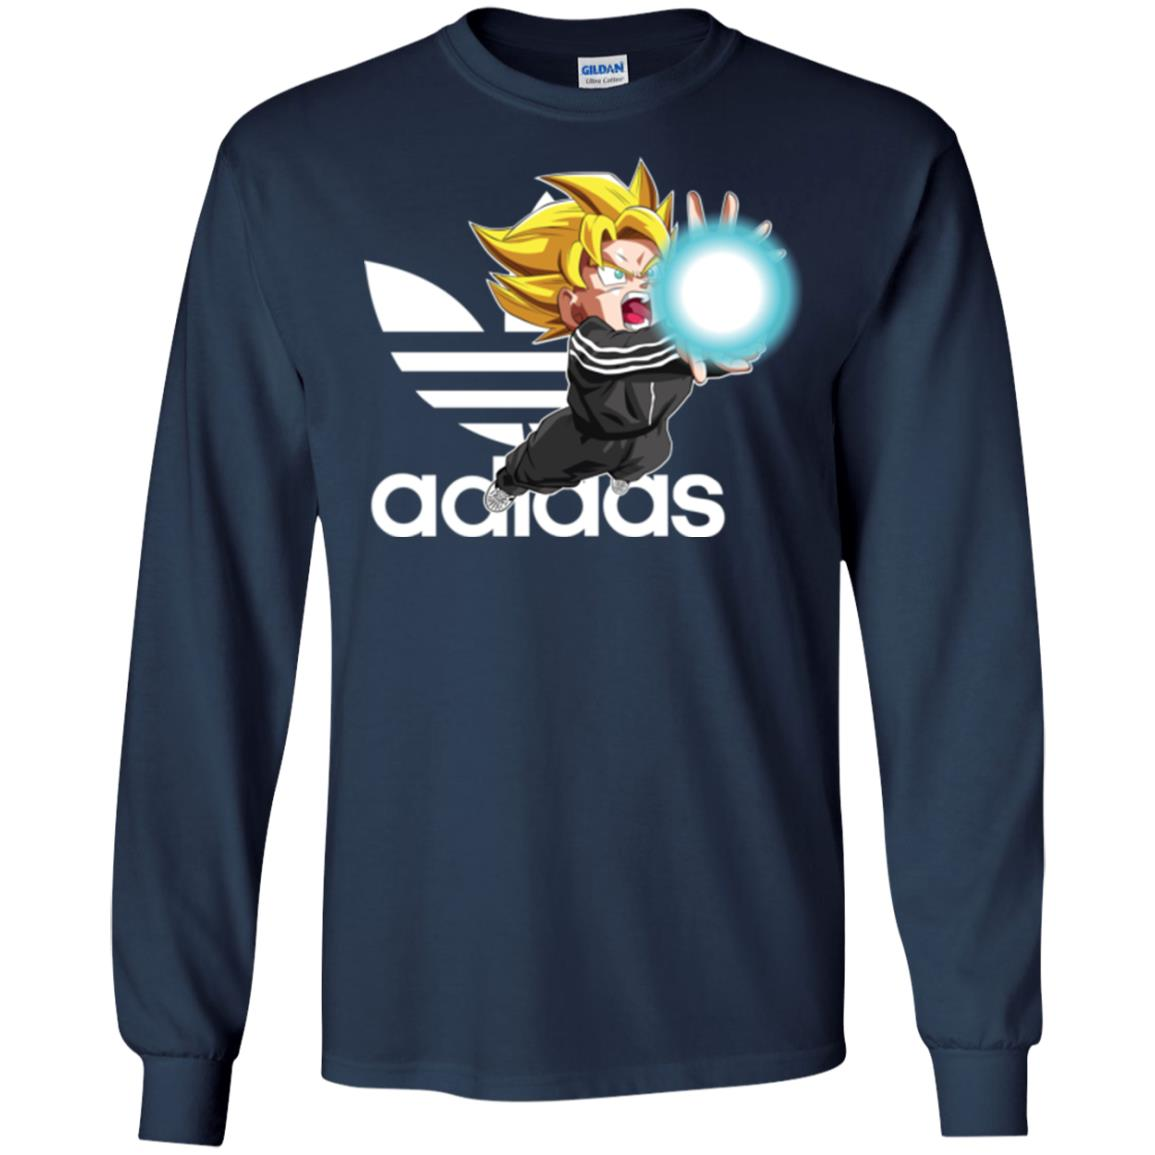 image 265px Goku Adidas Mashup T Shirt, Hoodies, Tank Top Available